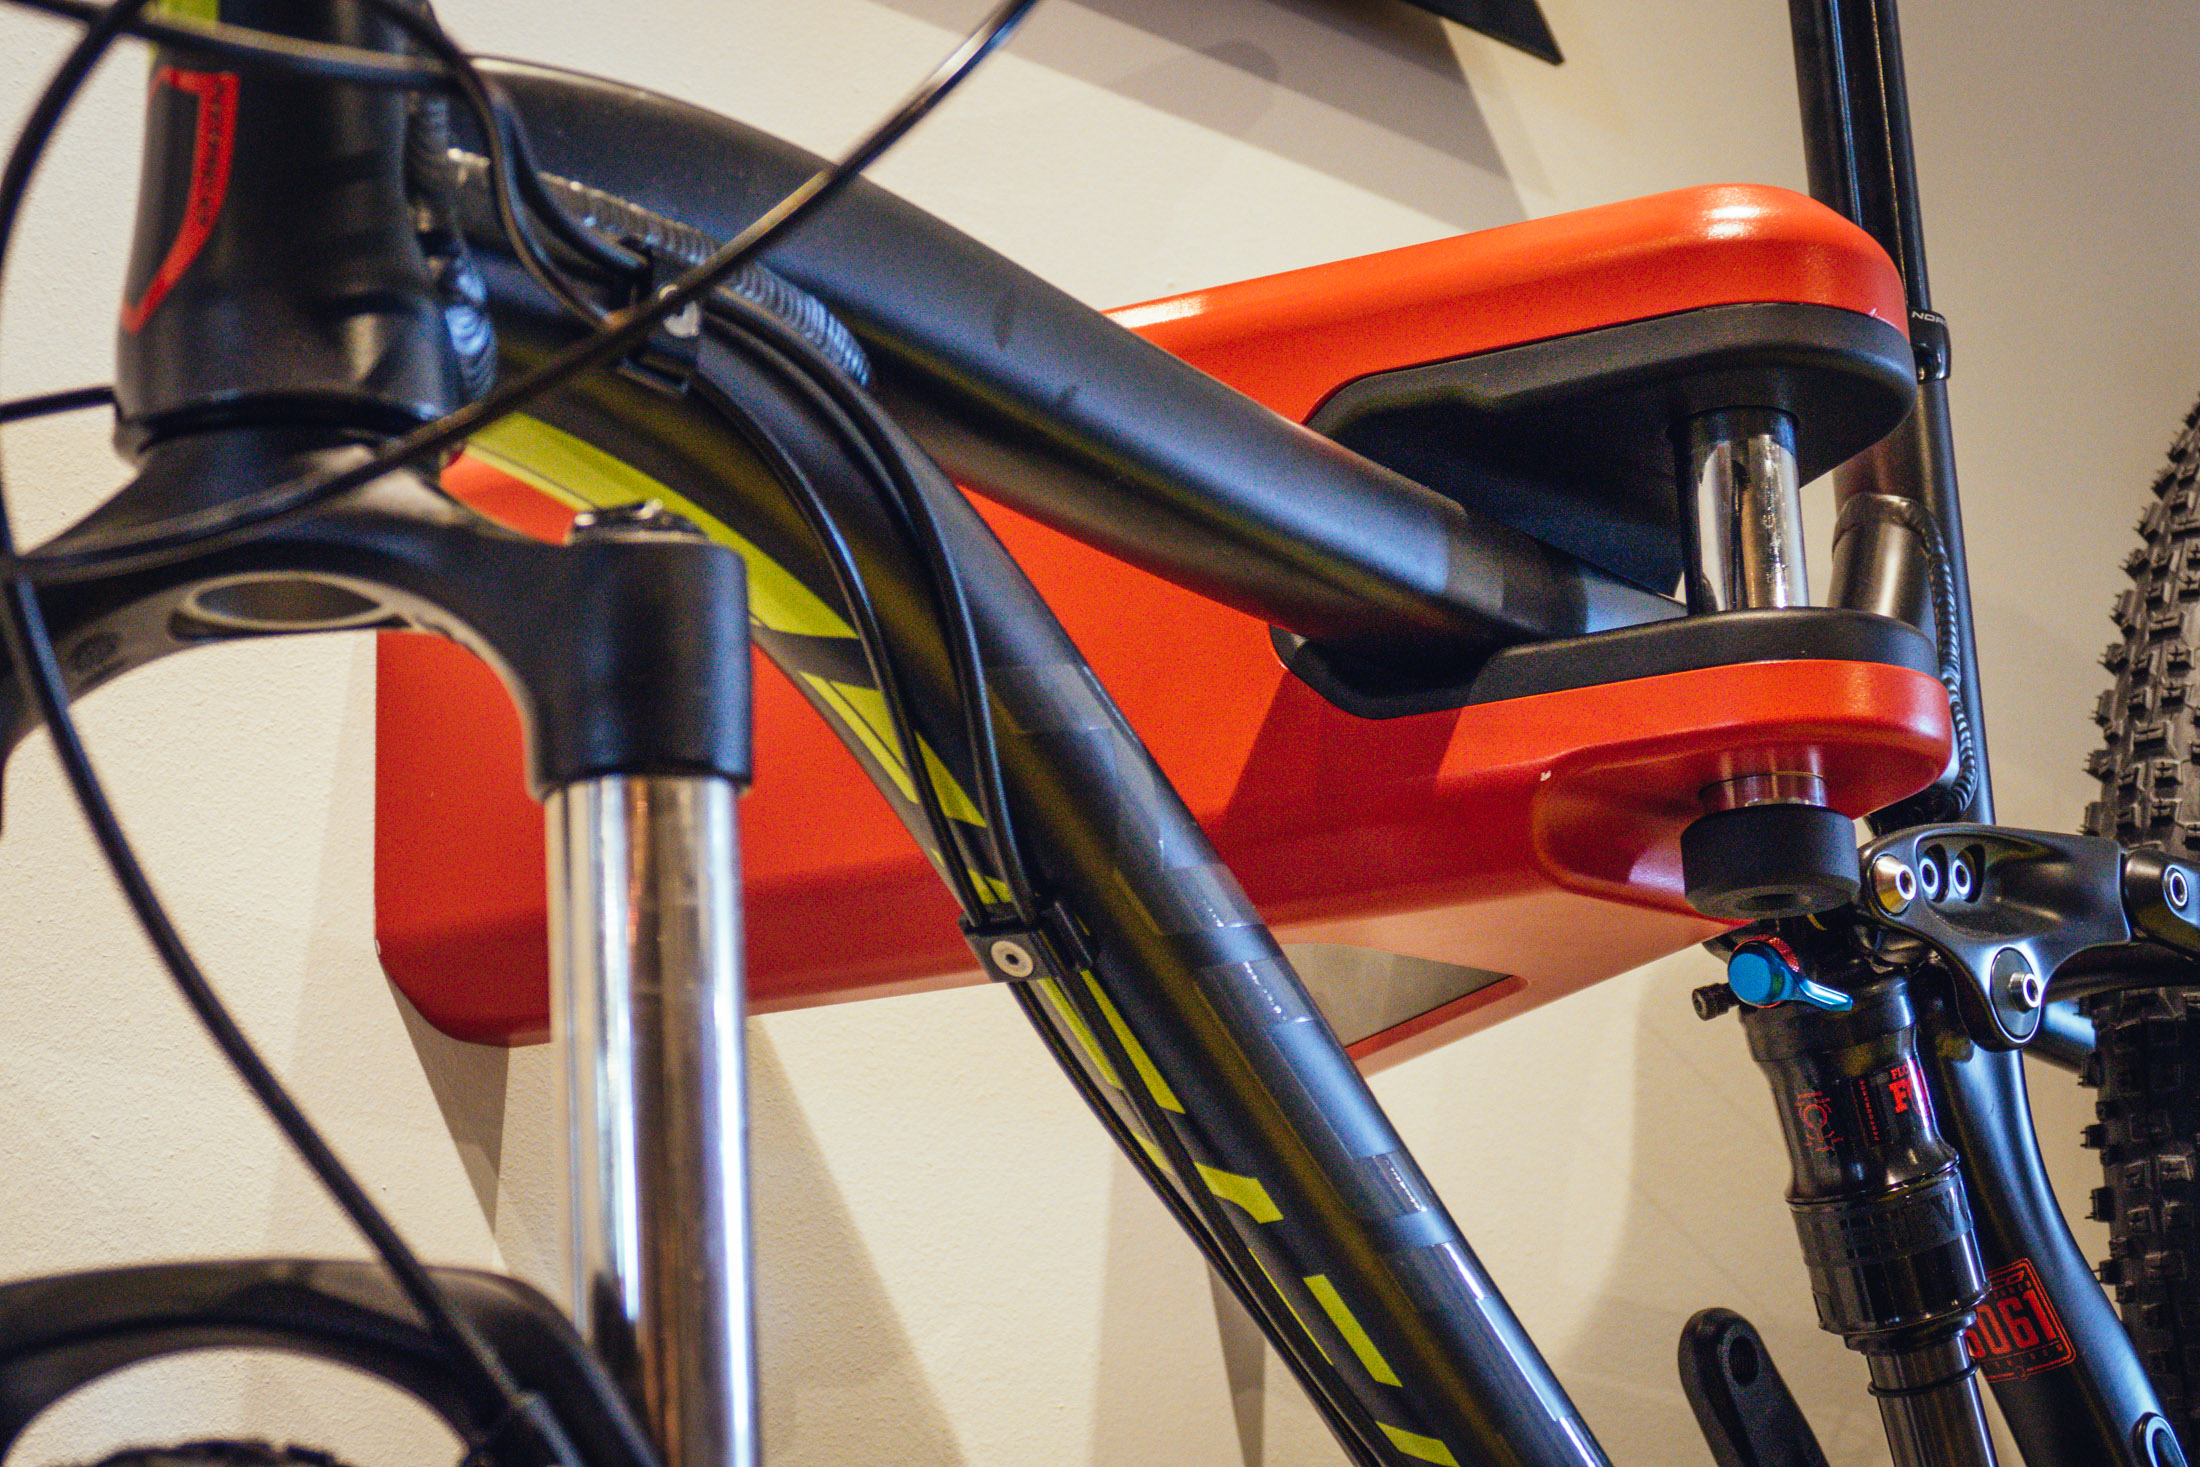 Airlok Wall Mount Bike Rack Eurobike 2017 Mountain Bike Components Mountain Biking Pictures Vital Mtb